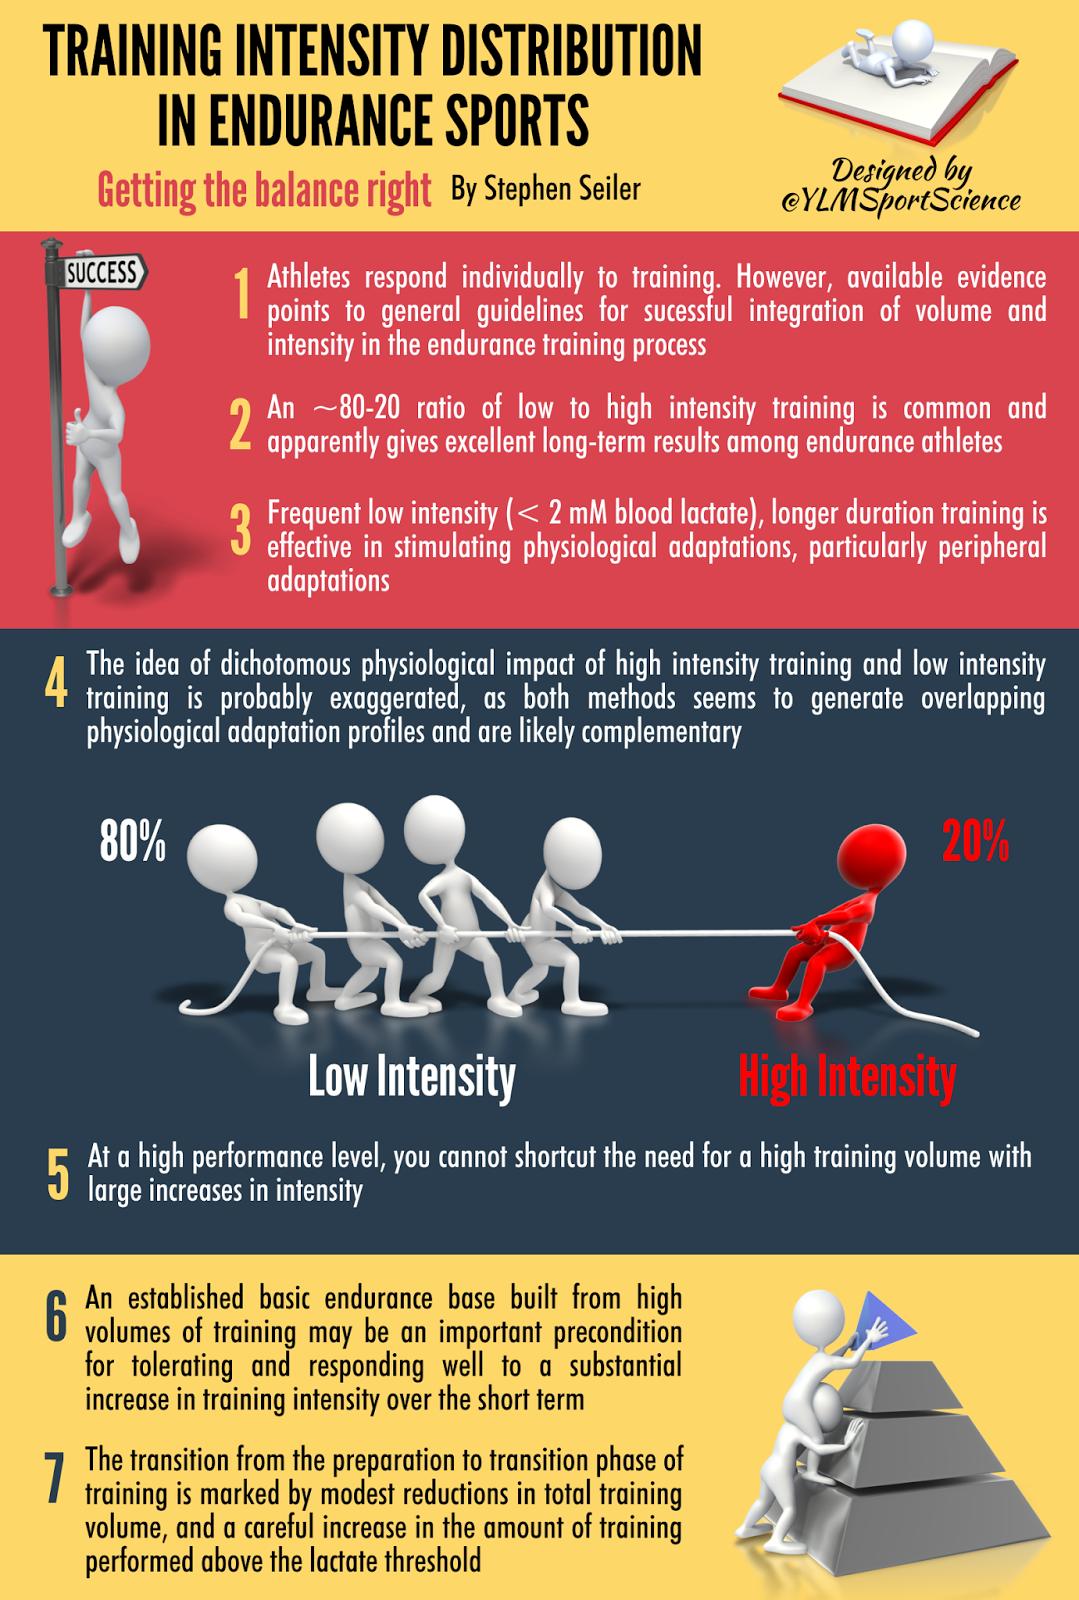 low intensity training